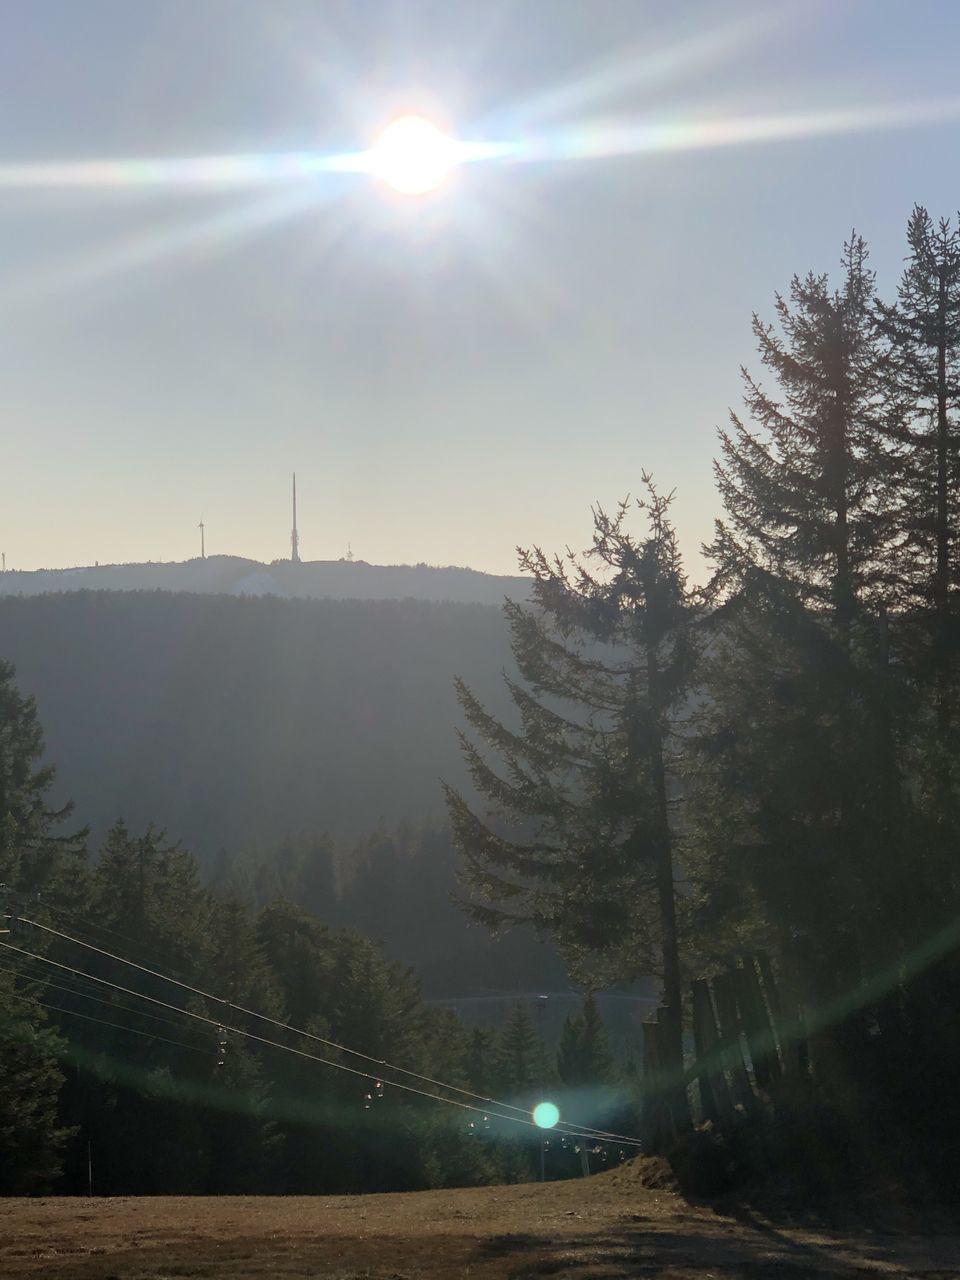 SCENIC VIEW OF SUN SHINING THROUGH TREES